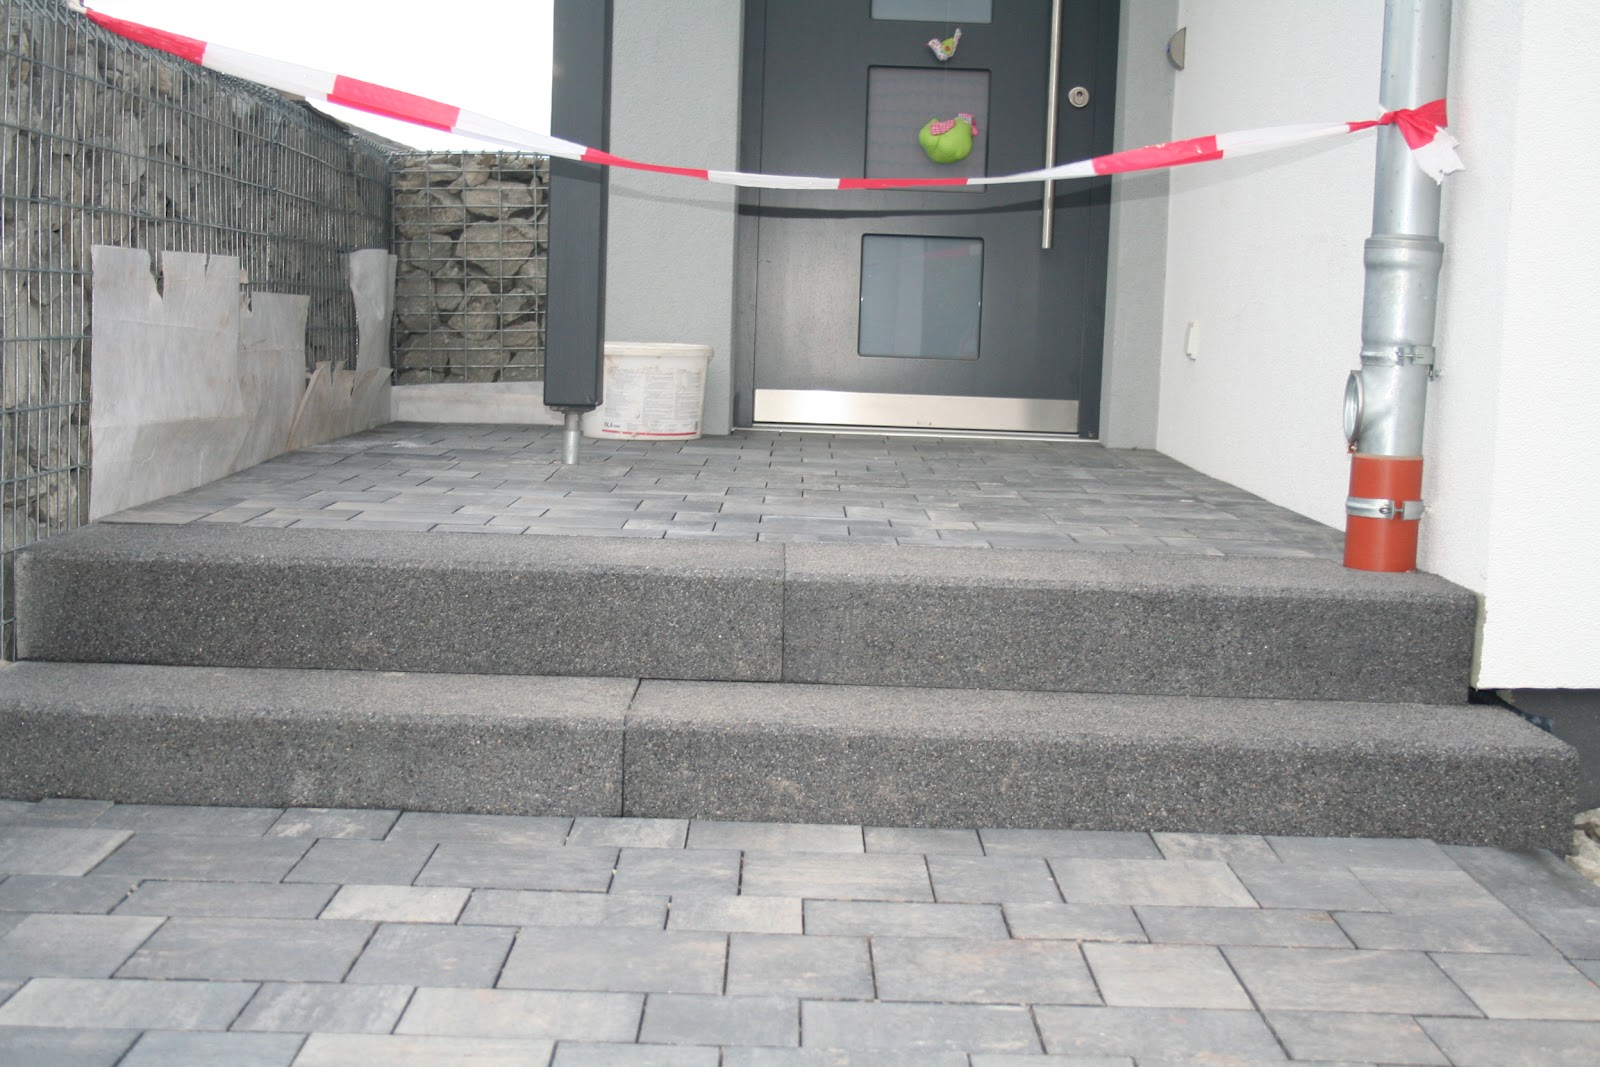 Unterbau Terrasse Schotter : Wir bau(t)en ein Fingerhaus AVEO in Hef Rof Juni 2012